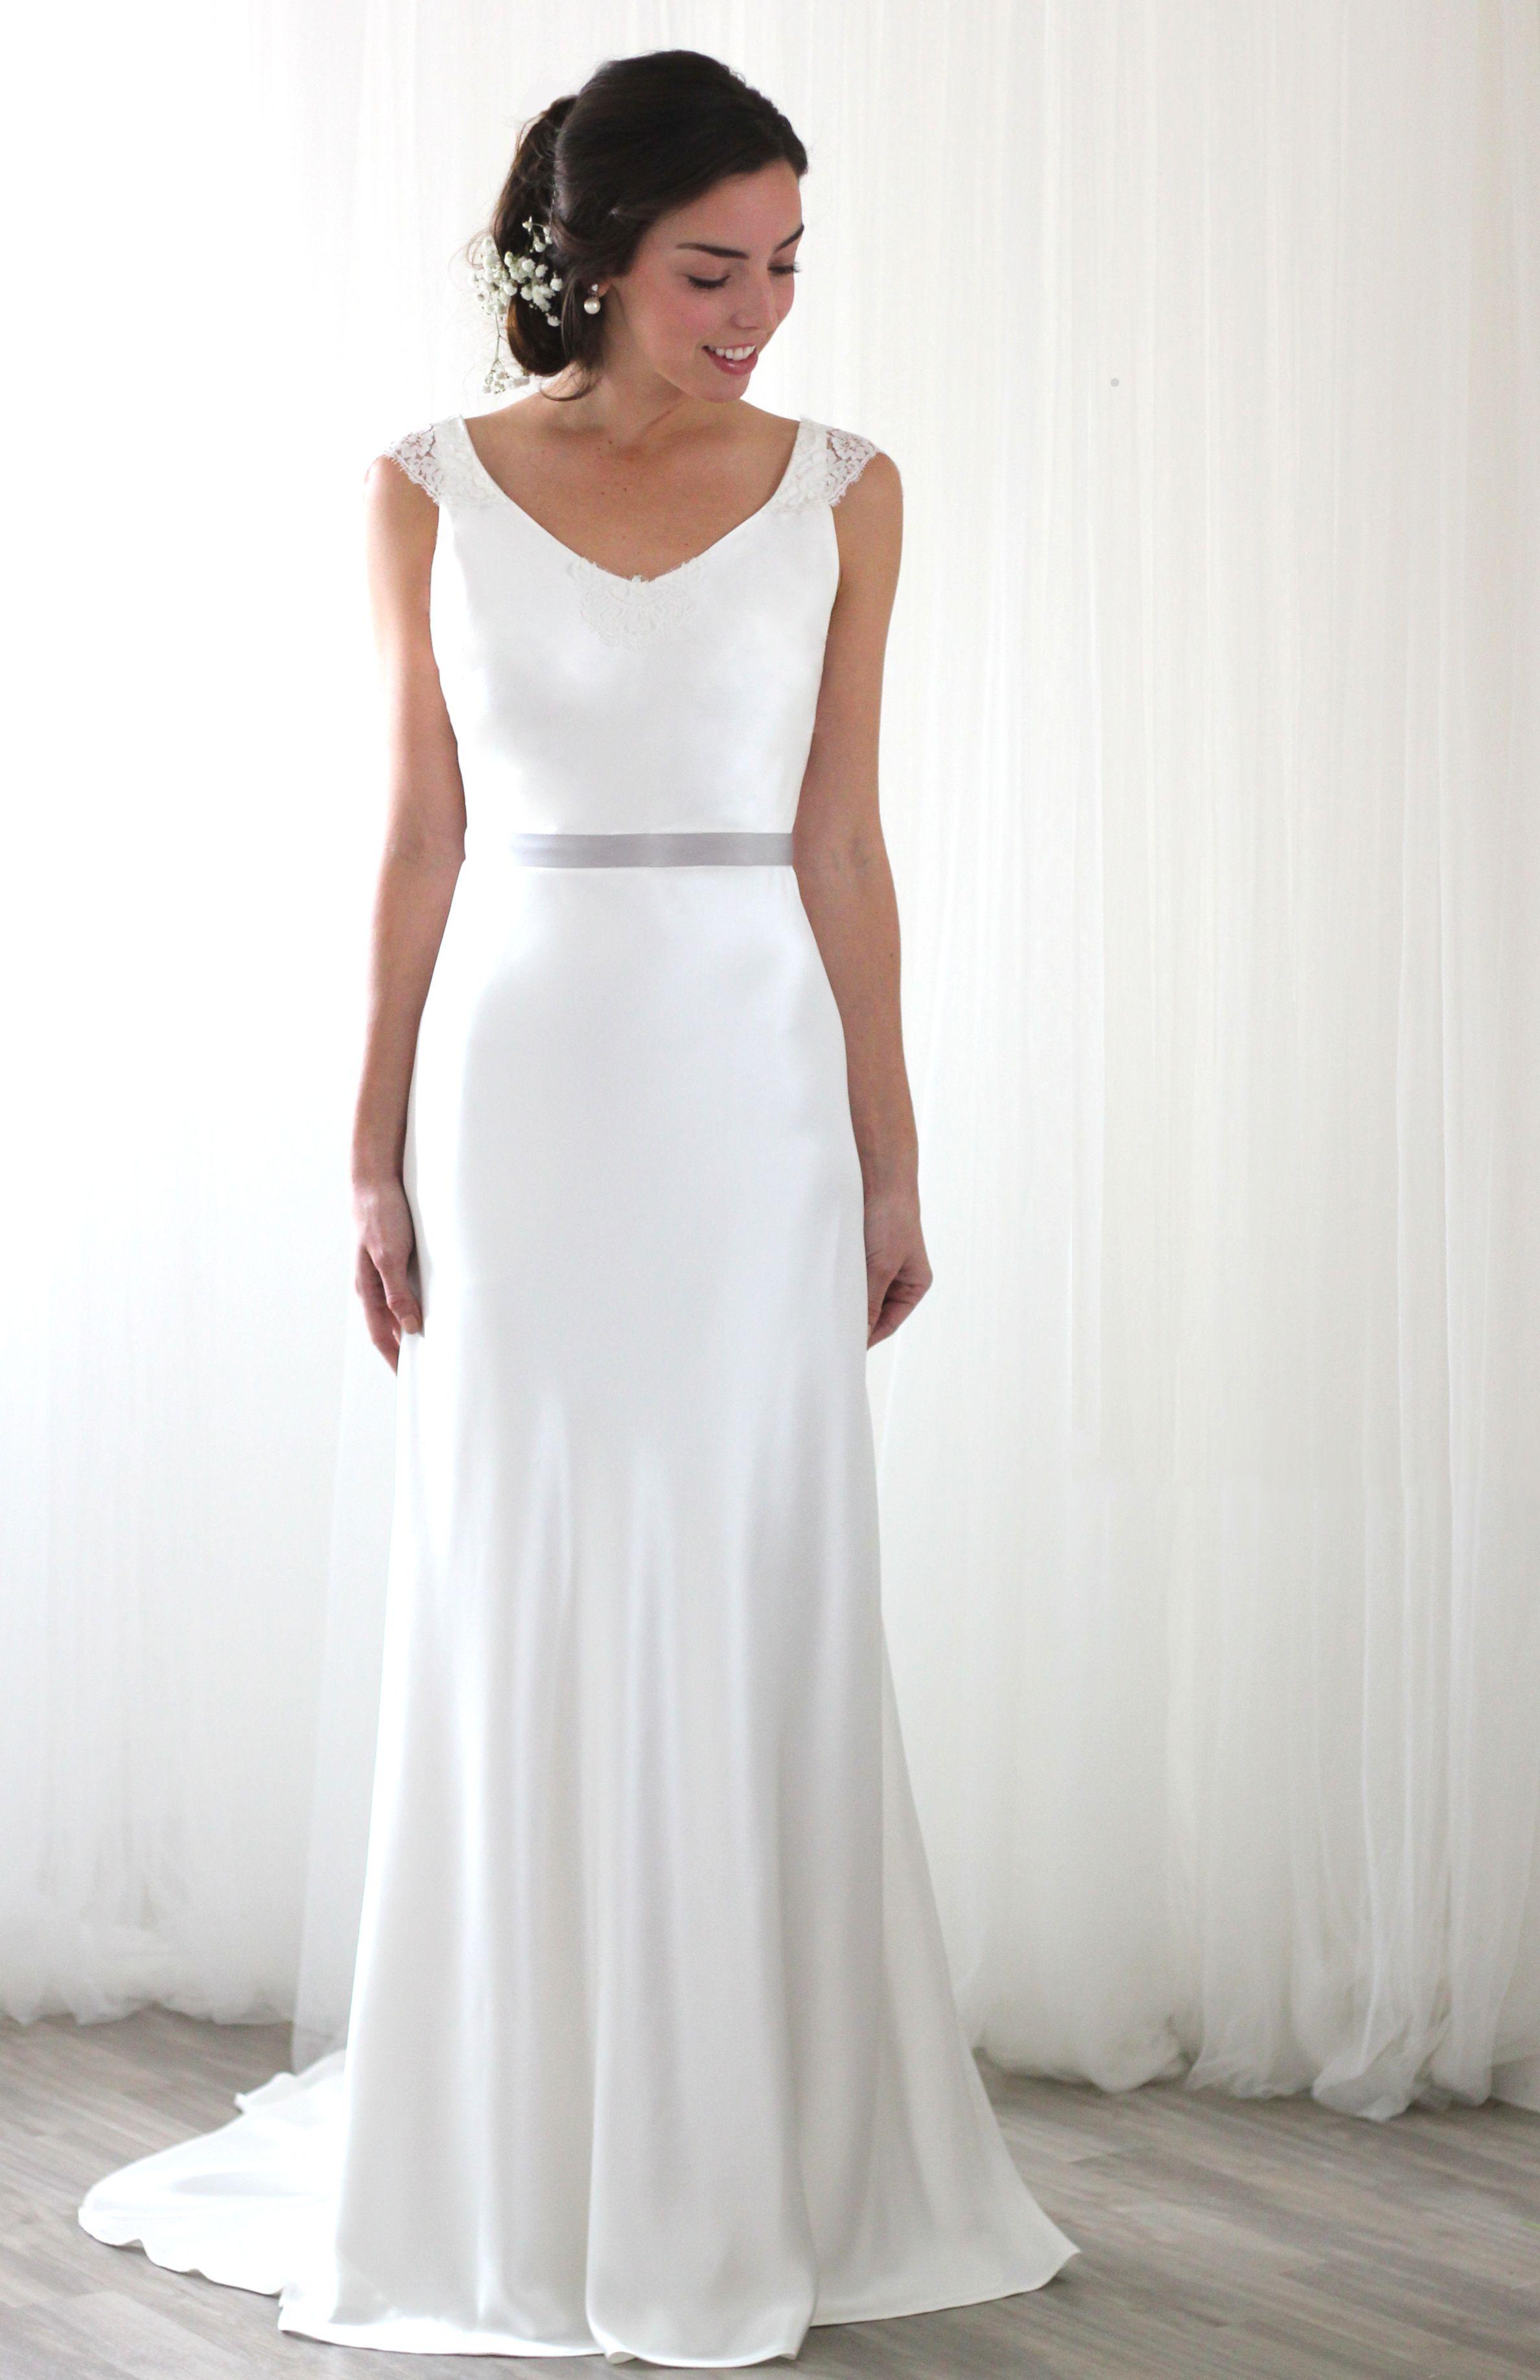 1b53d54ee56 Madeline Silk bias cut wedding dress Inspired by all things pretty ...